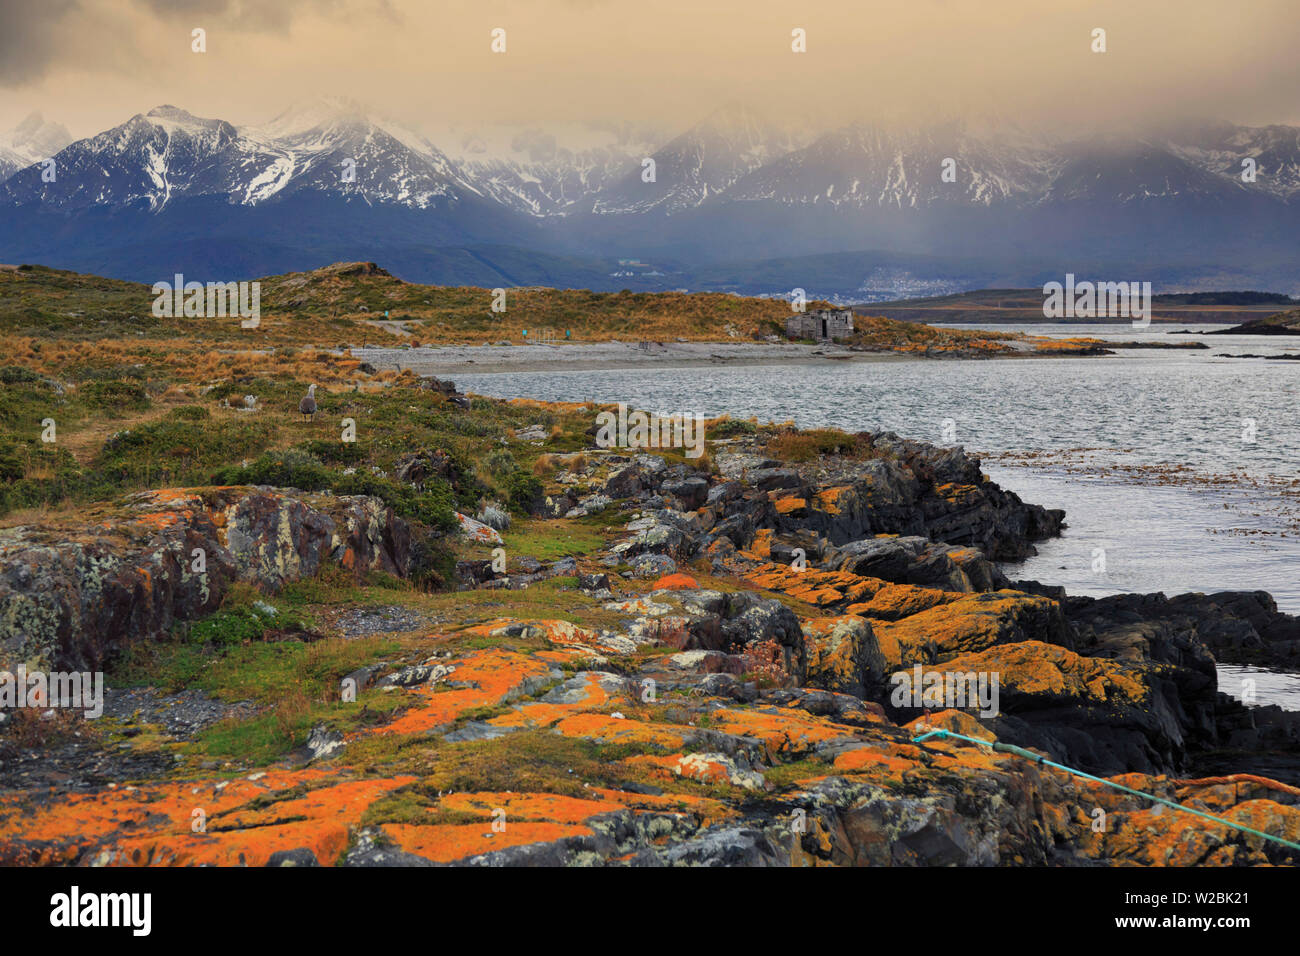 Argentina, Tierra del Fuego, Ushuaia, Beagle Channel - Stock Image